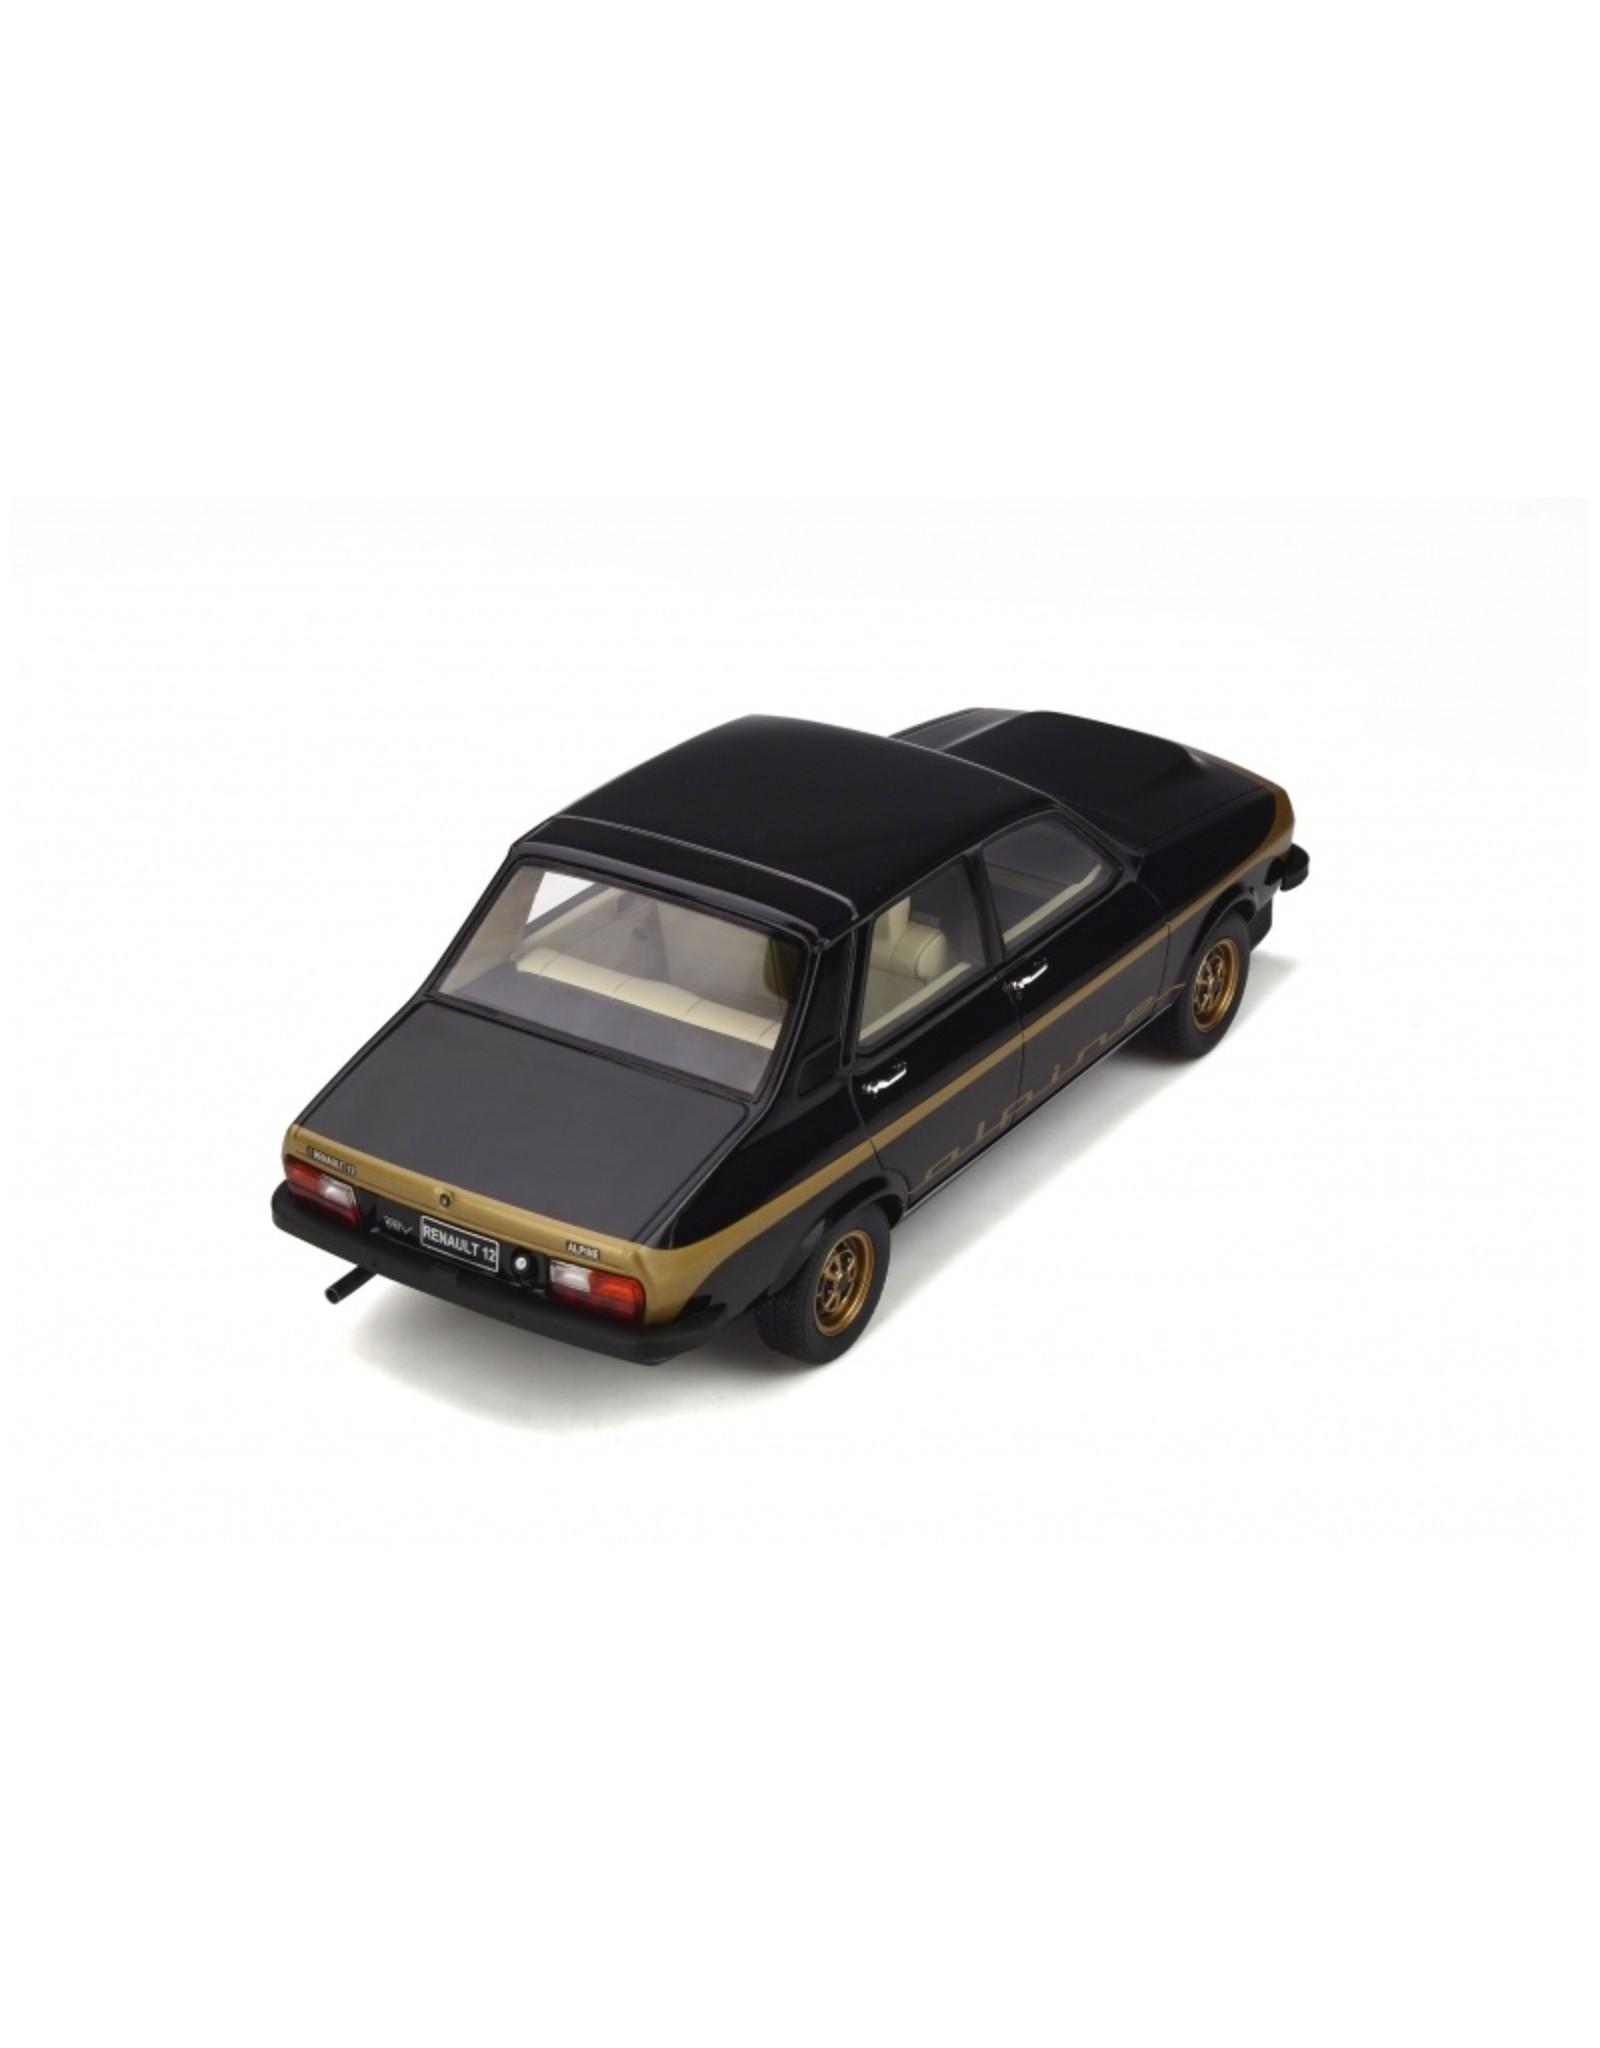 Renault Renault  R 12 Alpine 1978 - 1:18 - Otto Mobile Models